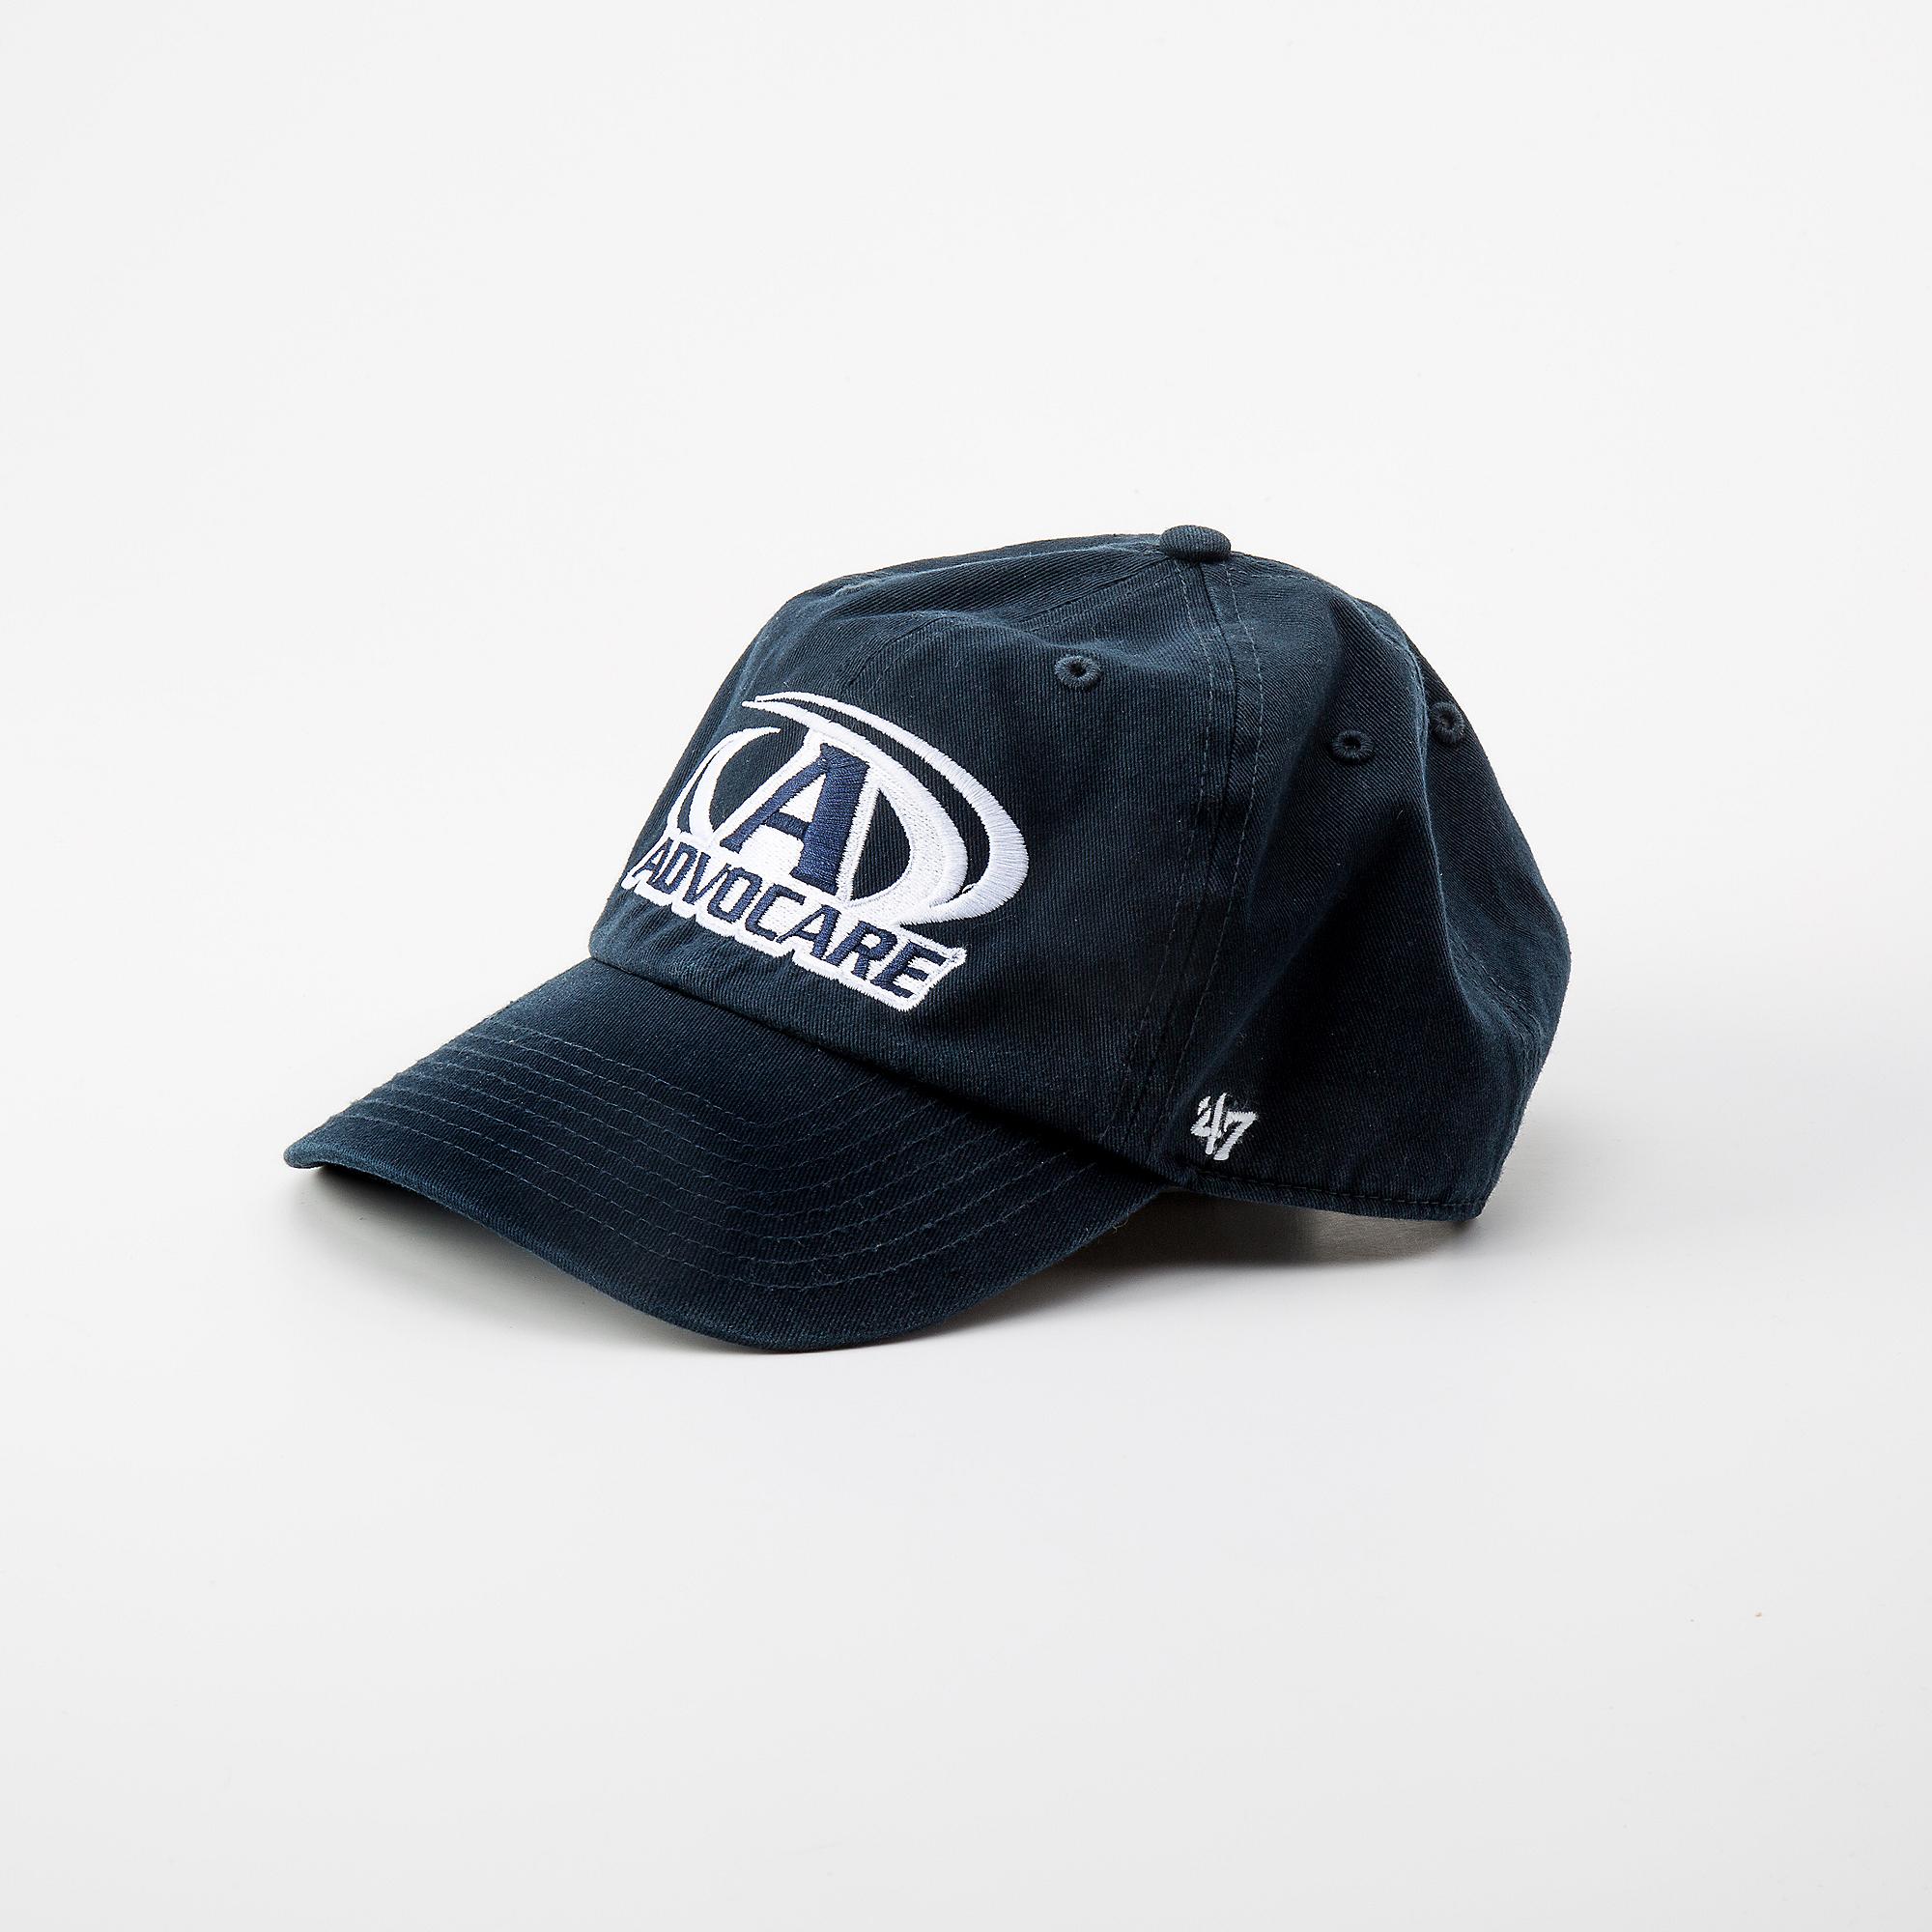 91681c8255b AdvoCare 47 Operation Hat Trick Clean Up Cap